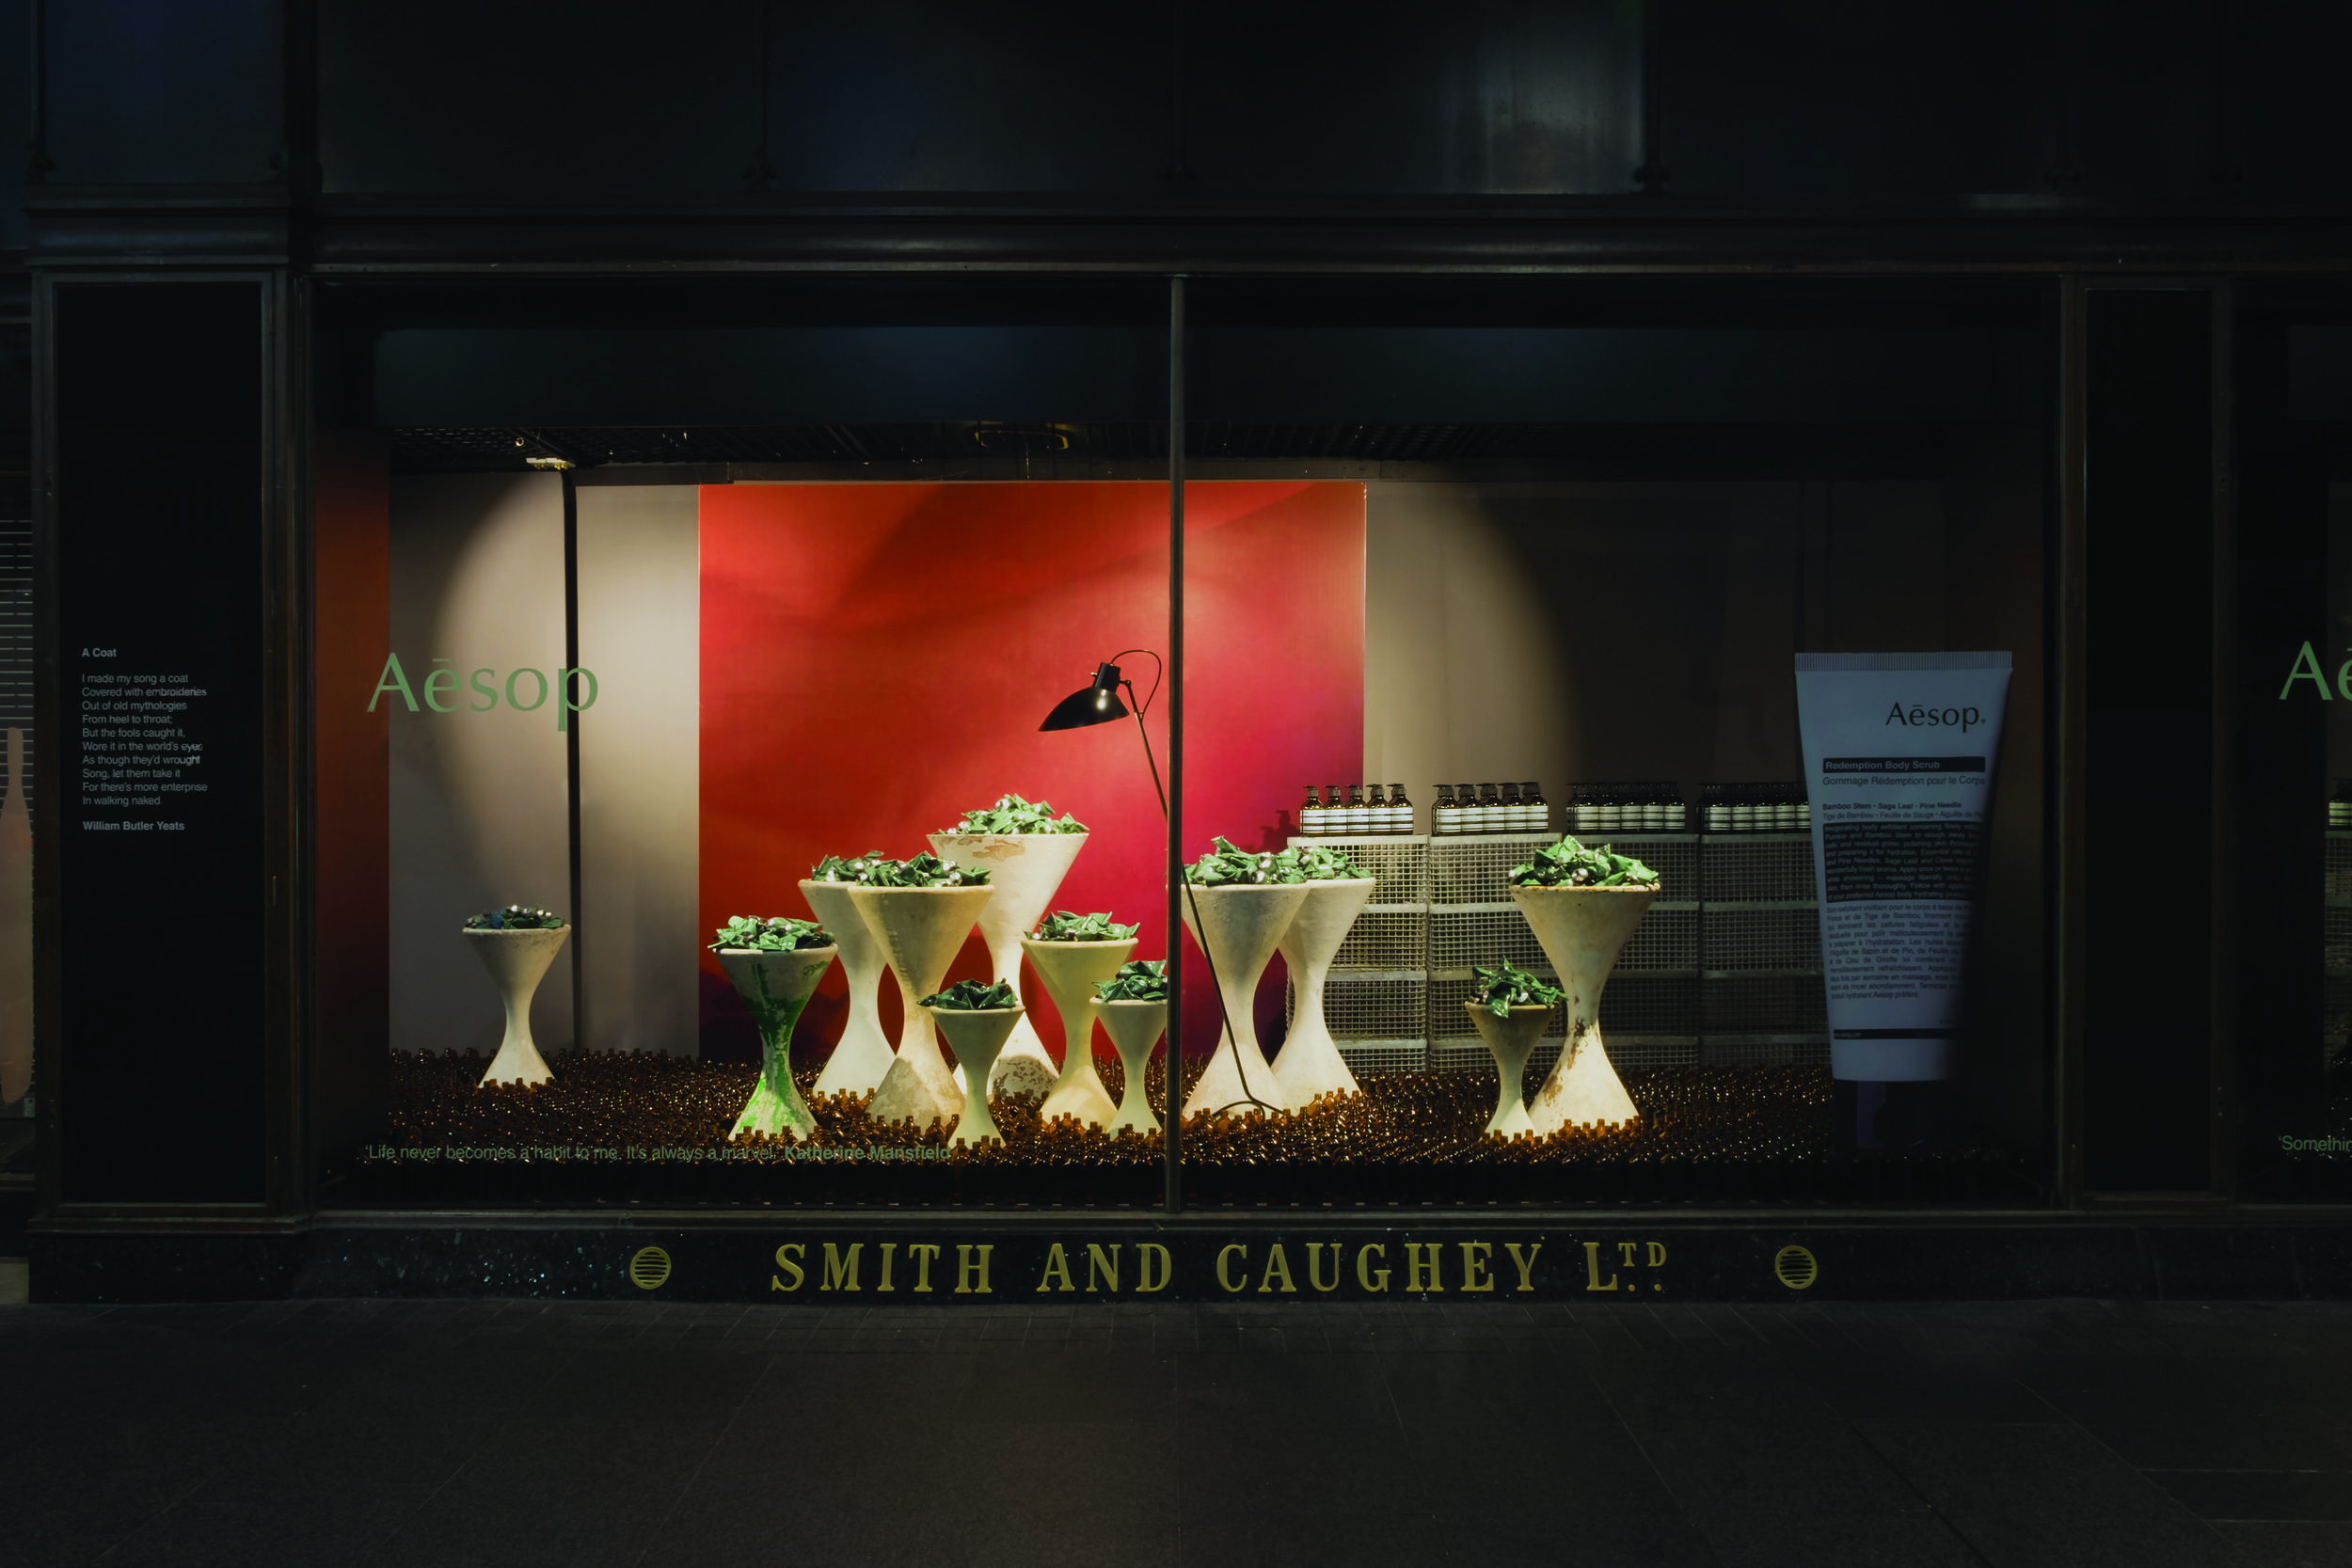 Aesop features the Astep VV Cinquanta floor lamp in bold Smith & Caughey installation